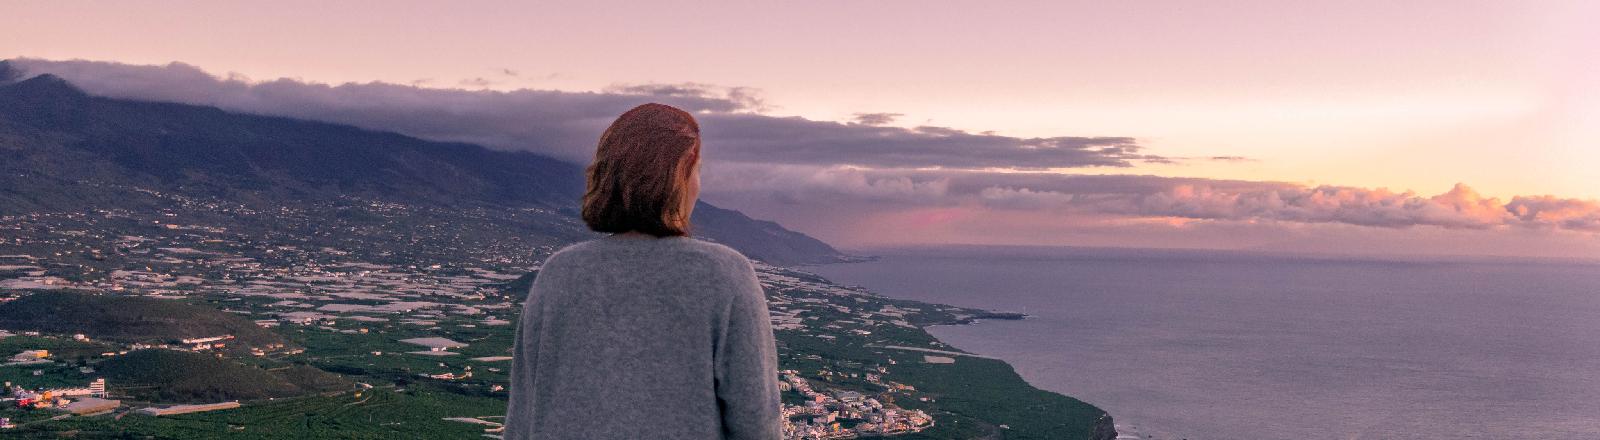 Reisebloggerin Luise Kenner schaut dem Sonnenuntergang entgegen.